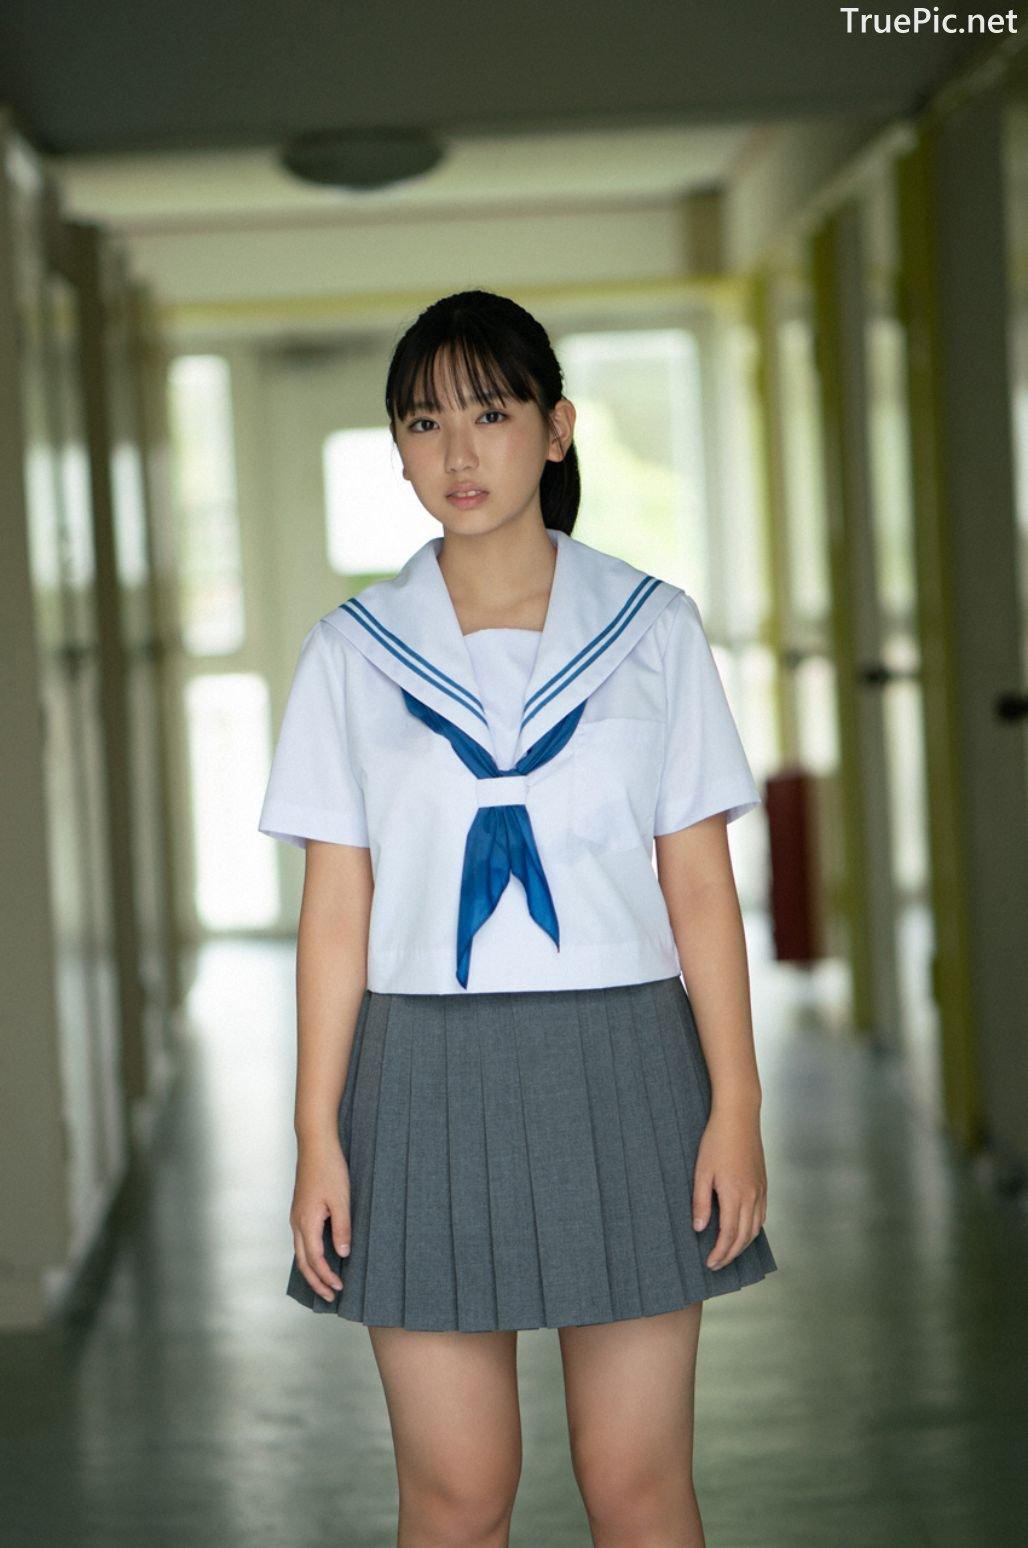 Image-Japanese-Pop-Idol-Aika-Sawaguchi-Champion-Road-TruePic.net- Picture-1